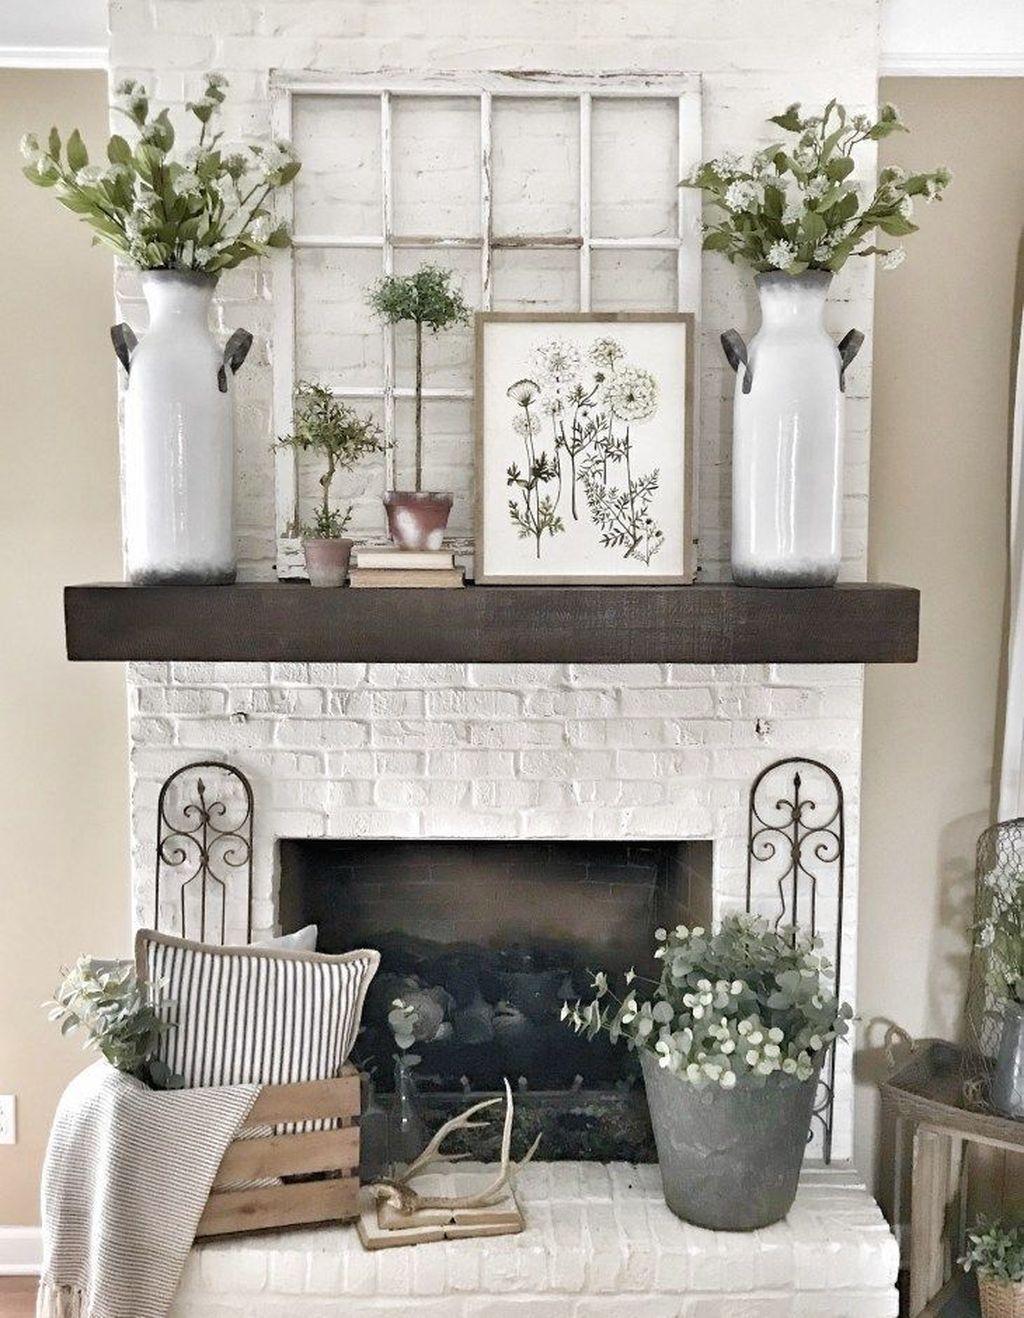 45 wonderful farmhouse style fireplace ideas home decor room rh pinterest com